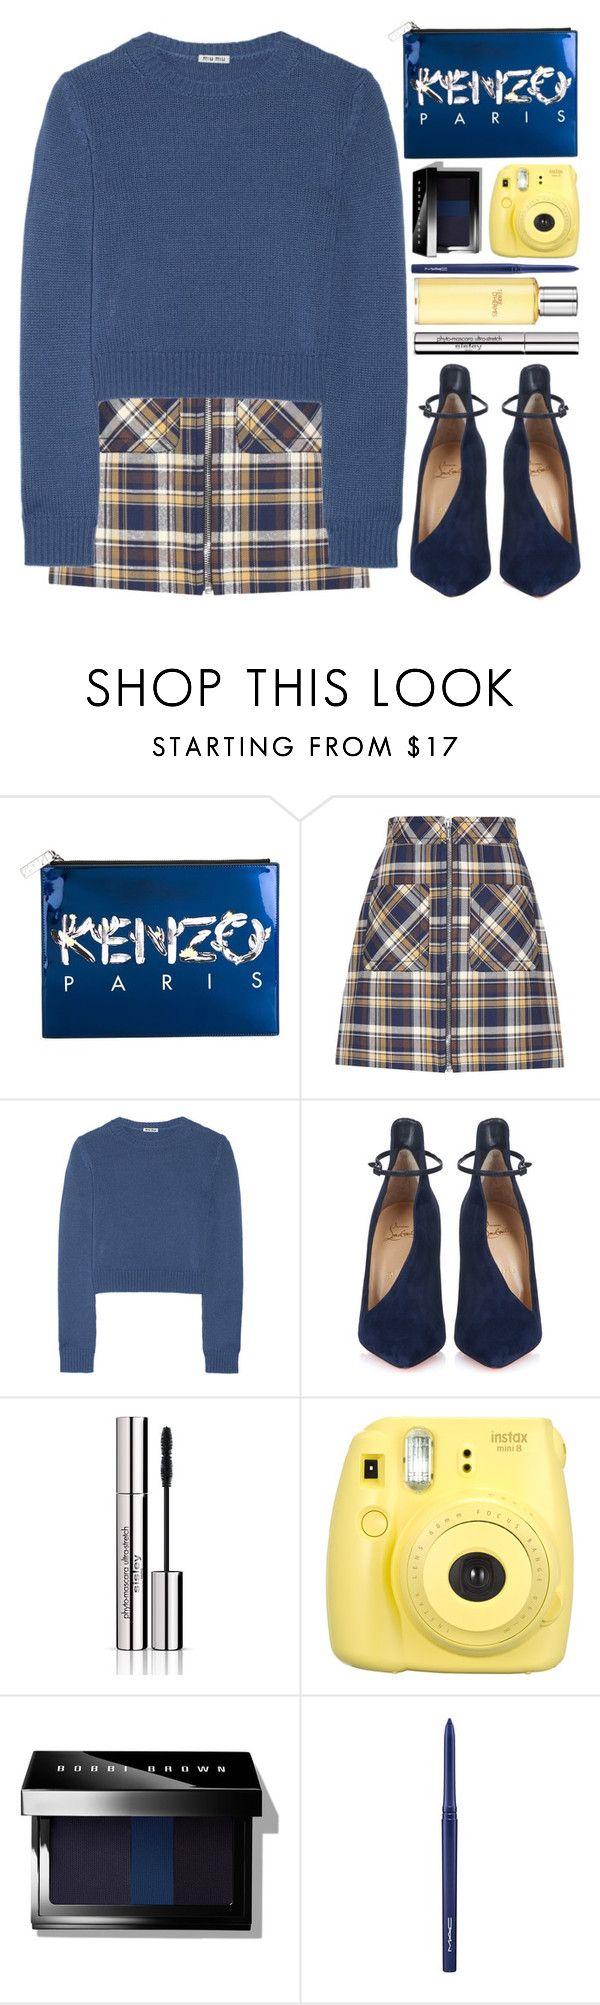 """#800 Marina"" by blueberrylexie on Polyvore featuring Kenzo, Miu Miu, Christian Louboutin, Sisley Paris, Bobbi Brown Cosmetics, MAC Cosmetics, Hermès, women's clothing, women and female"